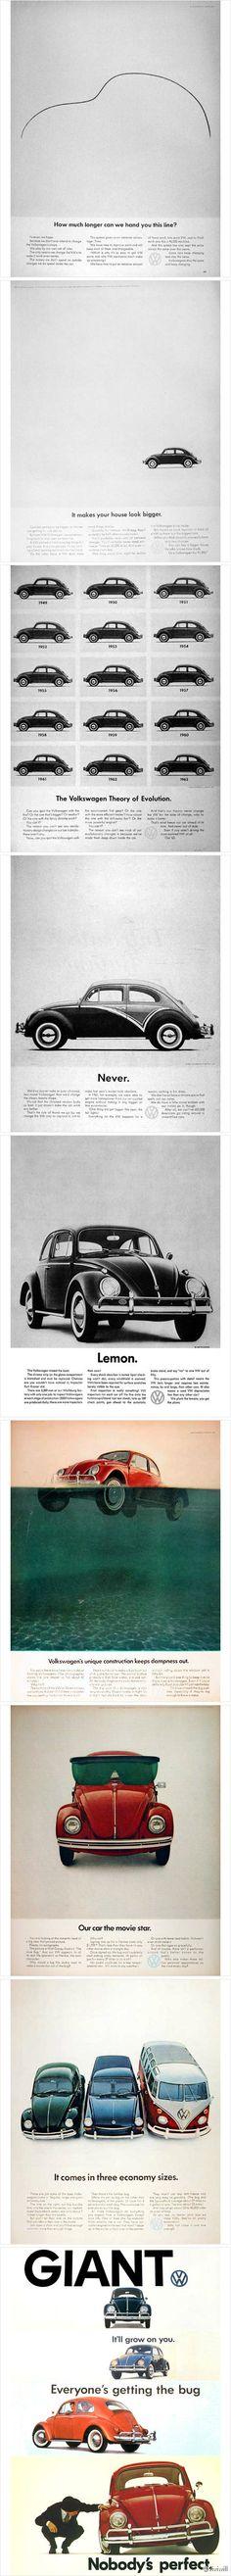 Volkswagen Beetle Ad Compile, Bill Bernbach, DDB